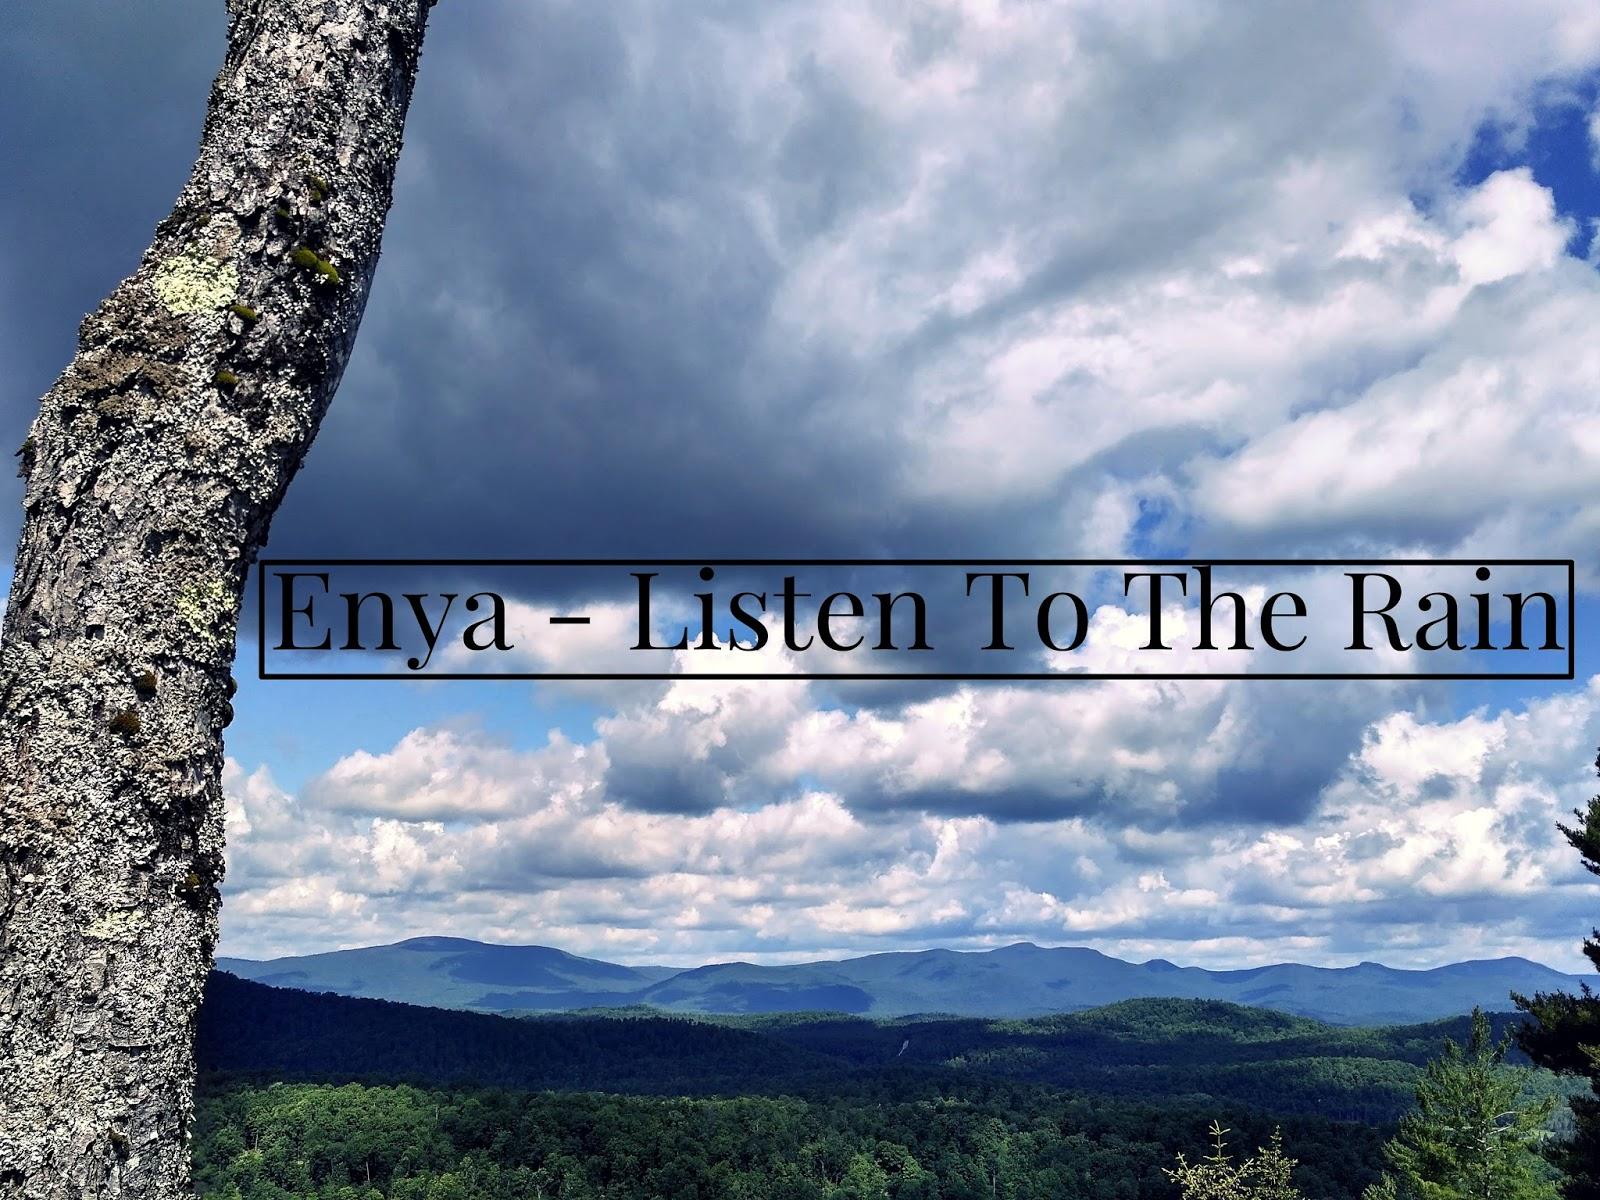 Ulubione piosenki Enya, Enya playlist, piosenki relaksacyjne, Enya